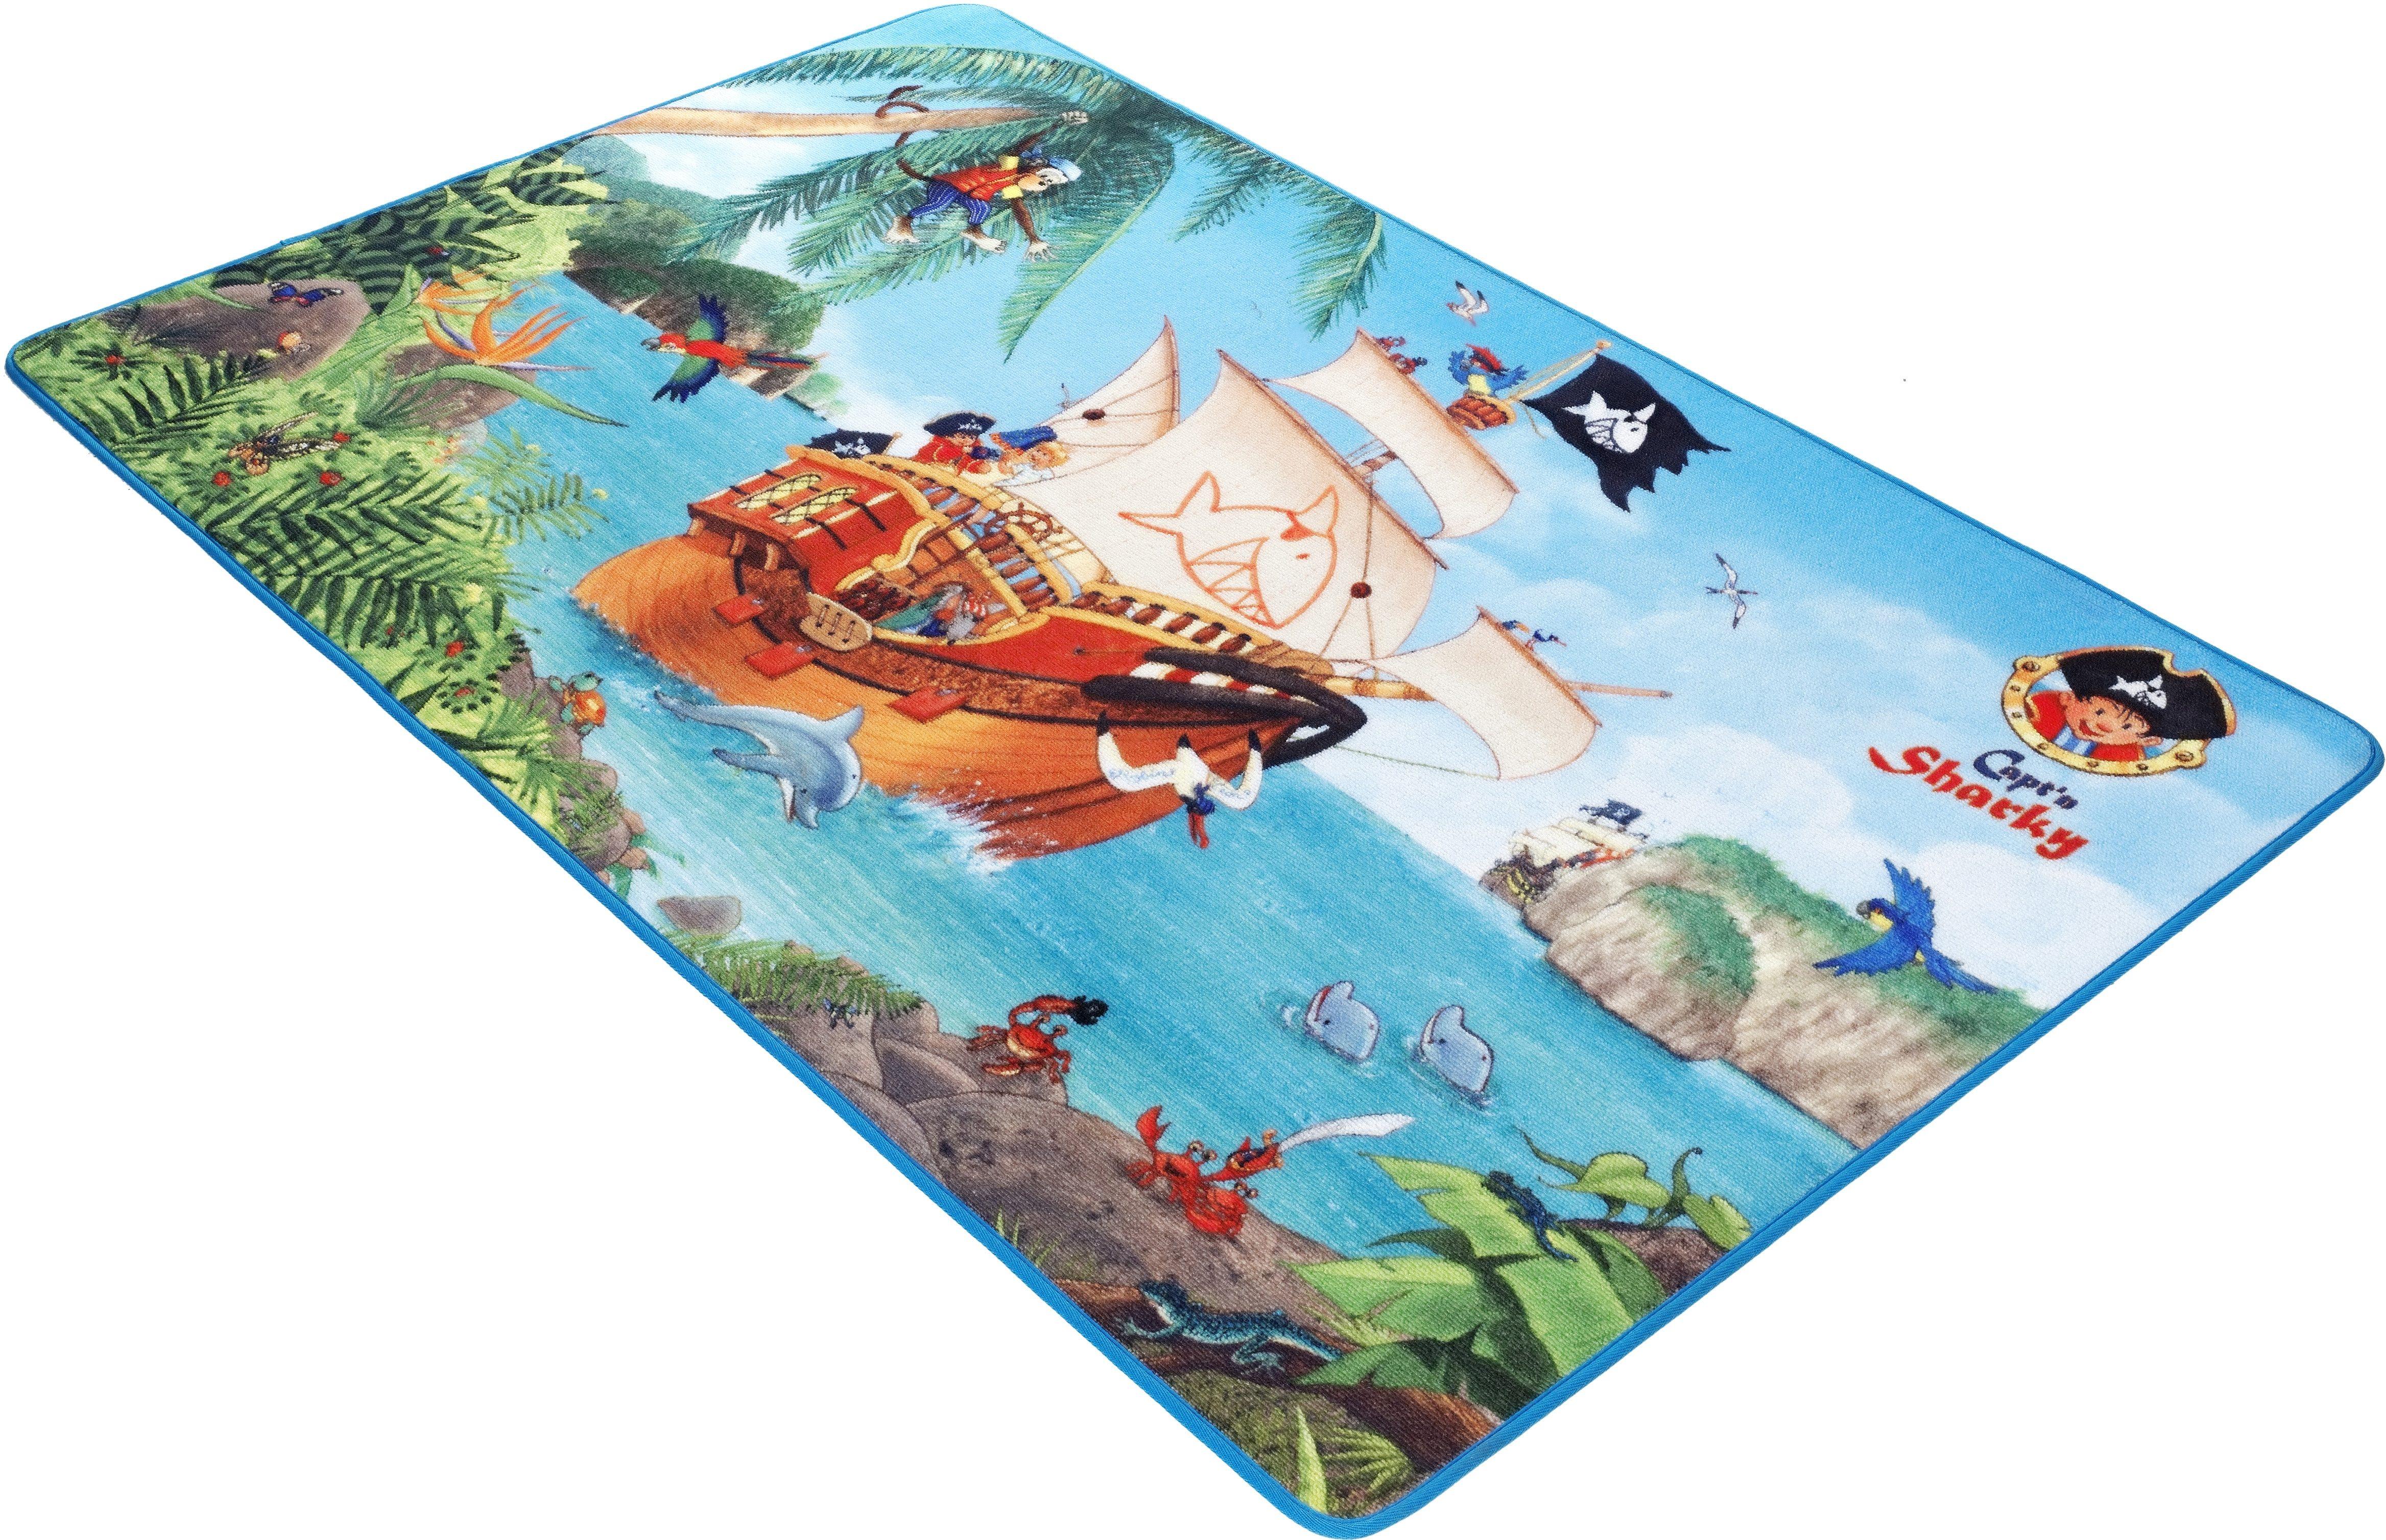 Kinder-Teppich, Capt'n Sharky, »SH-301«